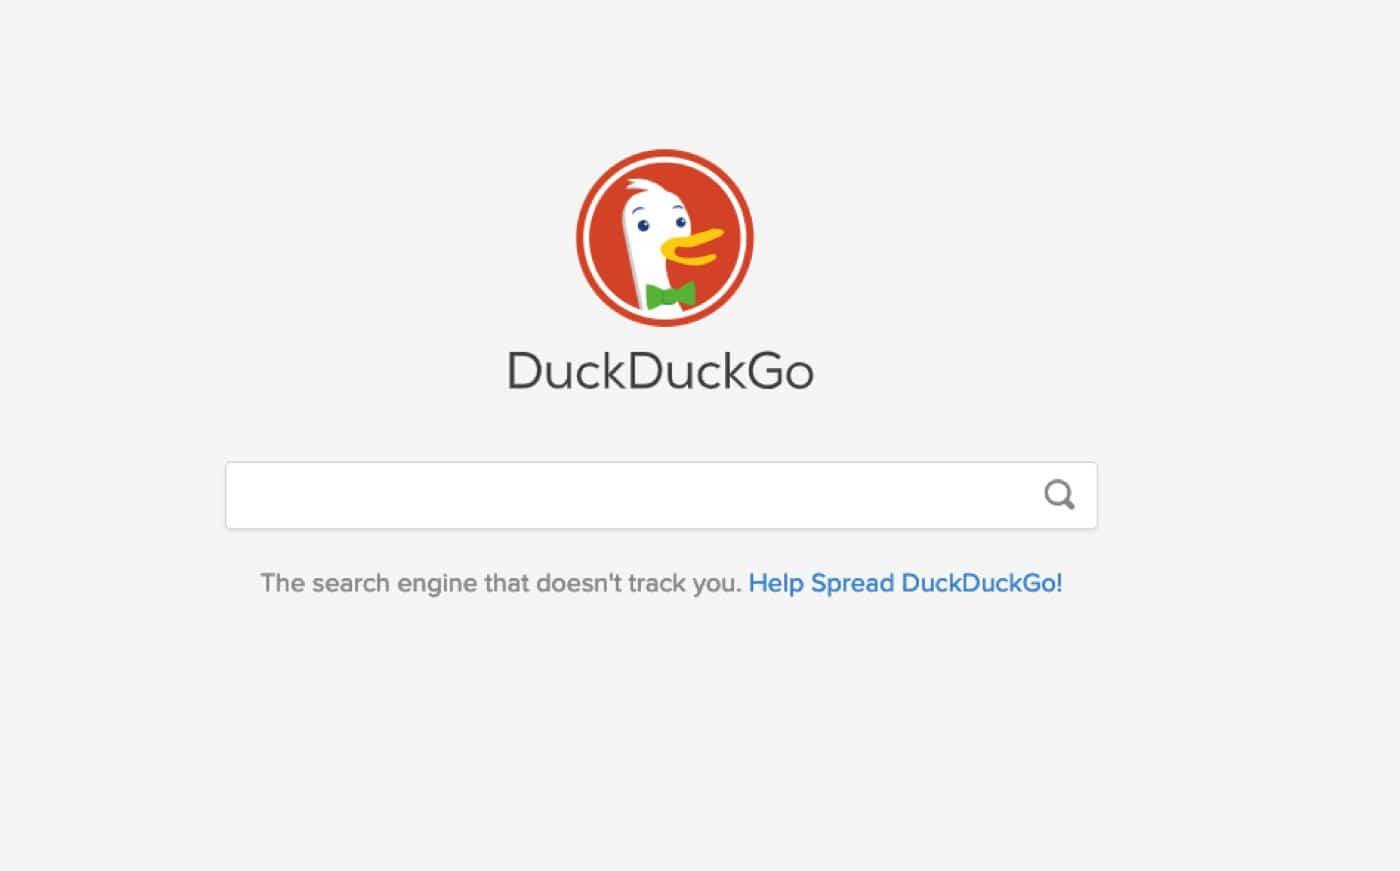 duckduckgo search page